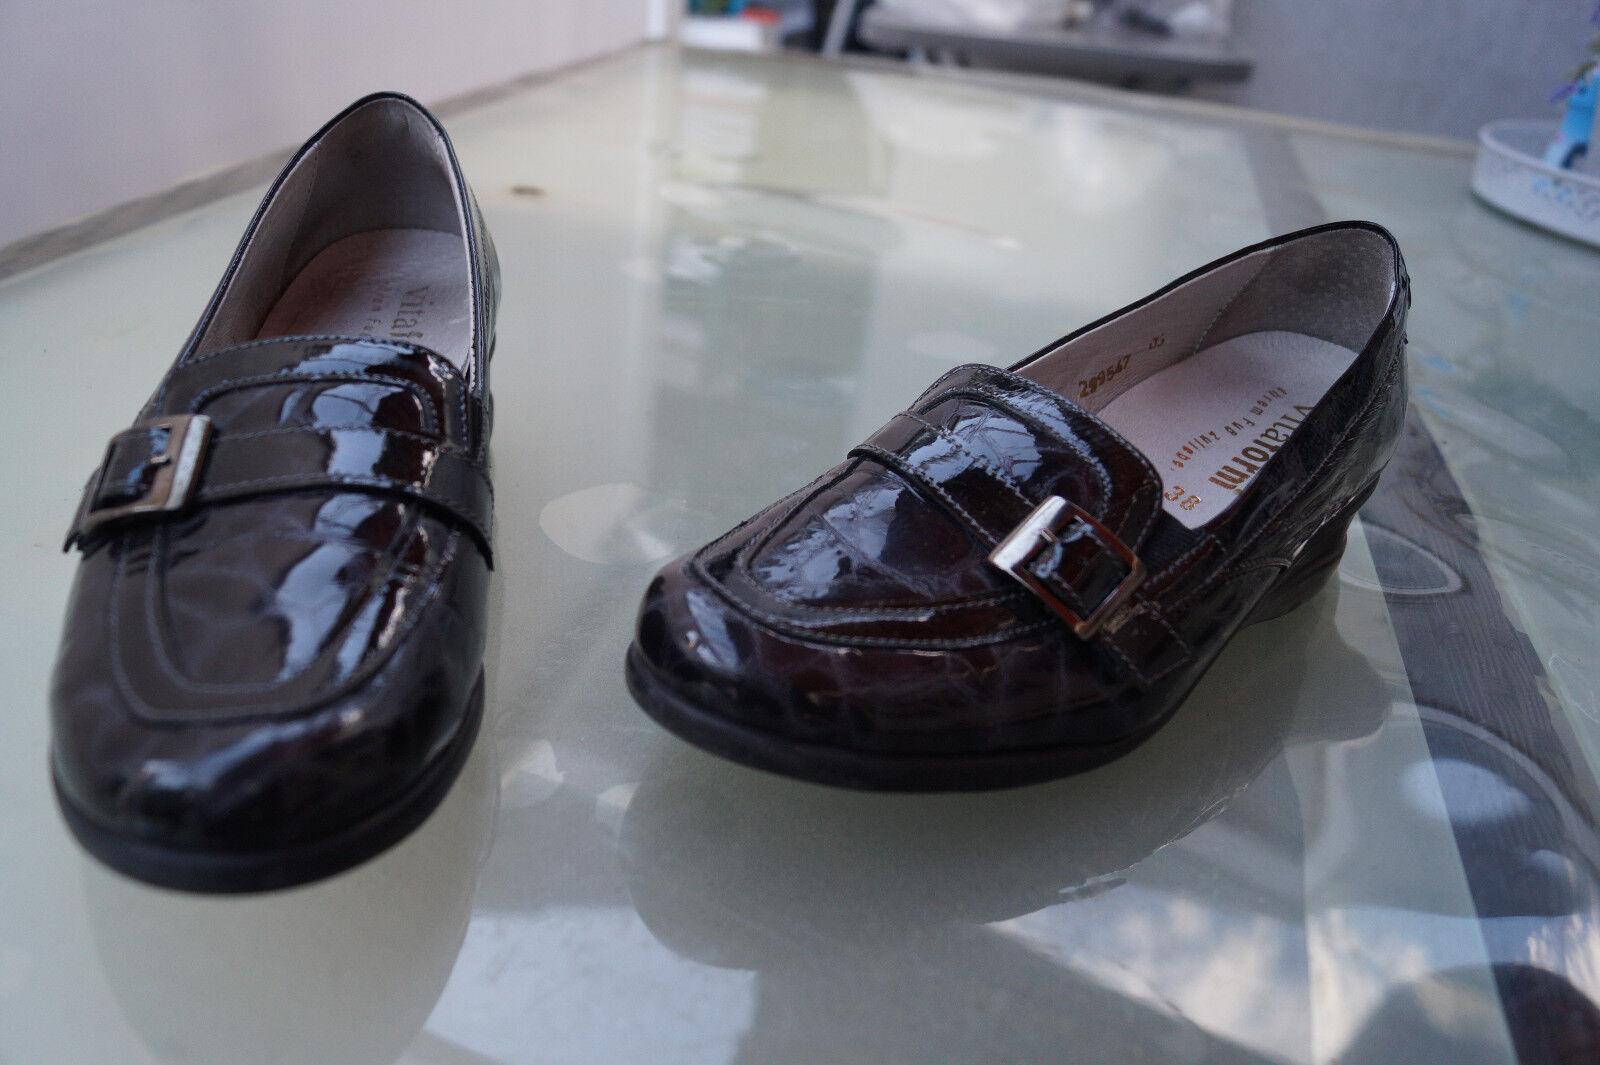 VITAFORM Damen Comfort Schuhe Mokassins Slipper Gr.38 Leder H schwarz grau Lack Leder Gr.38 dfedf7